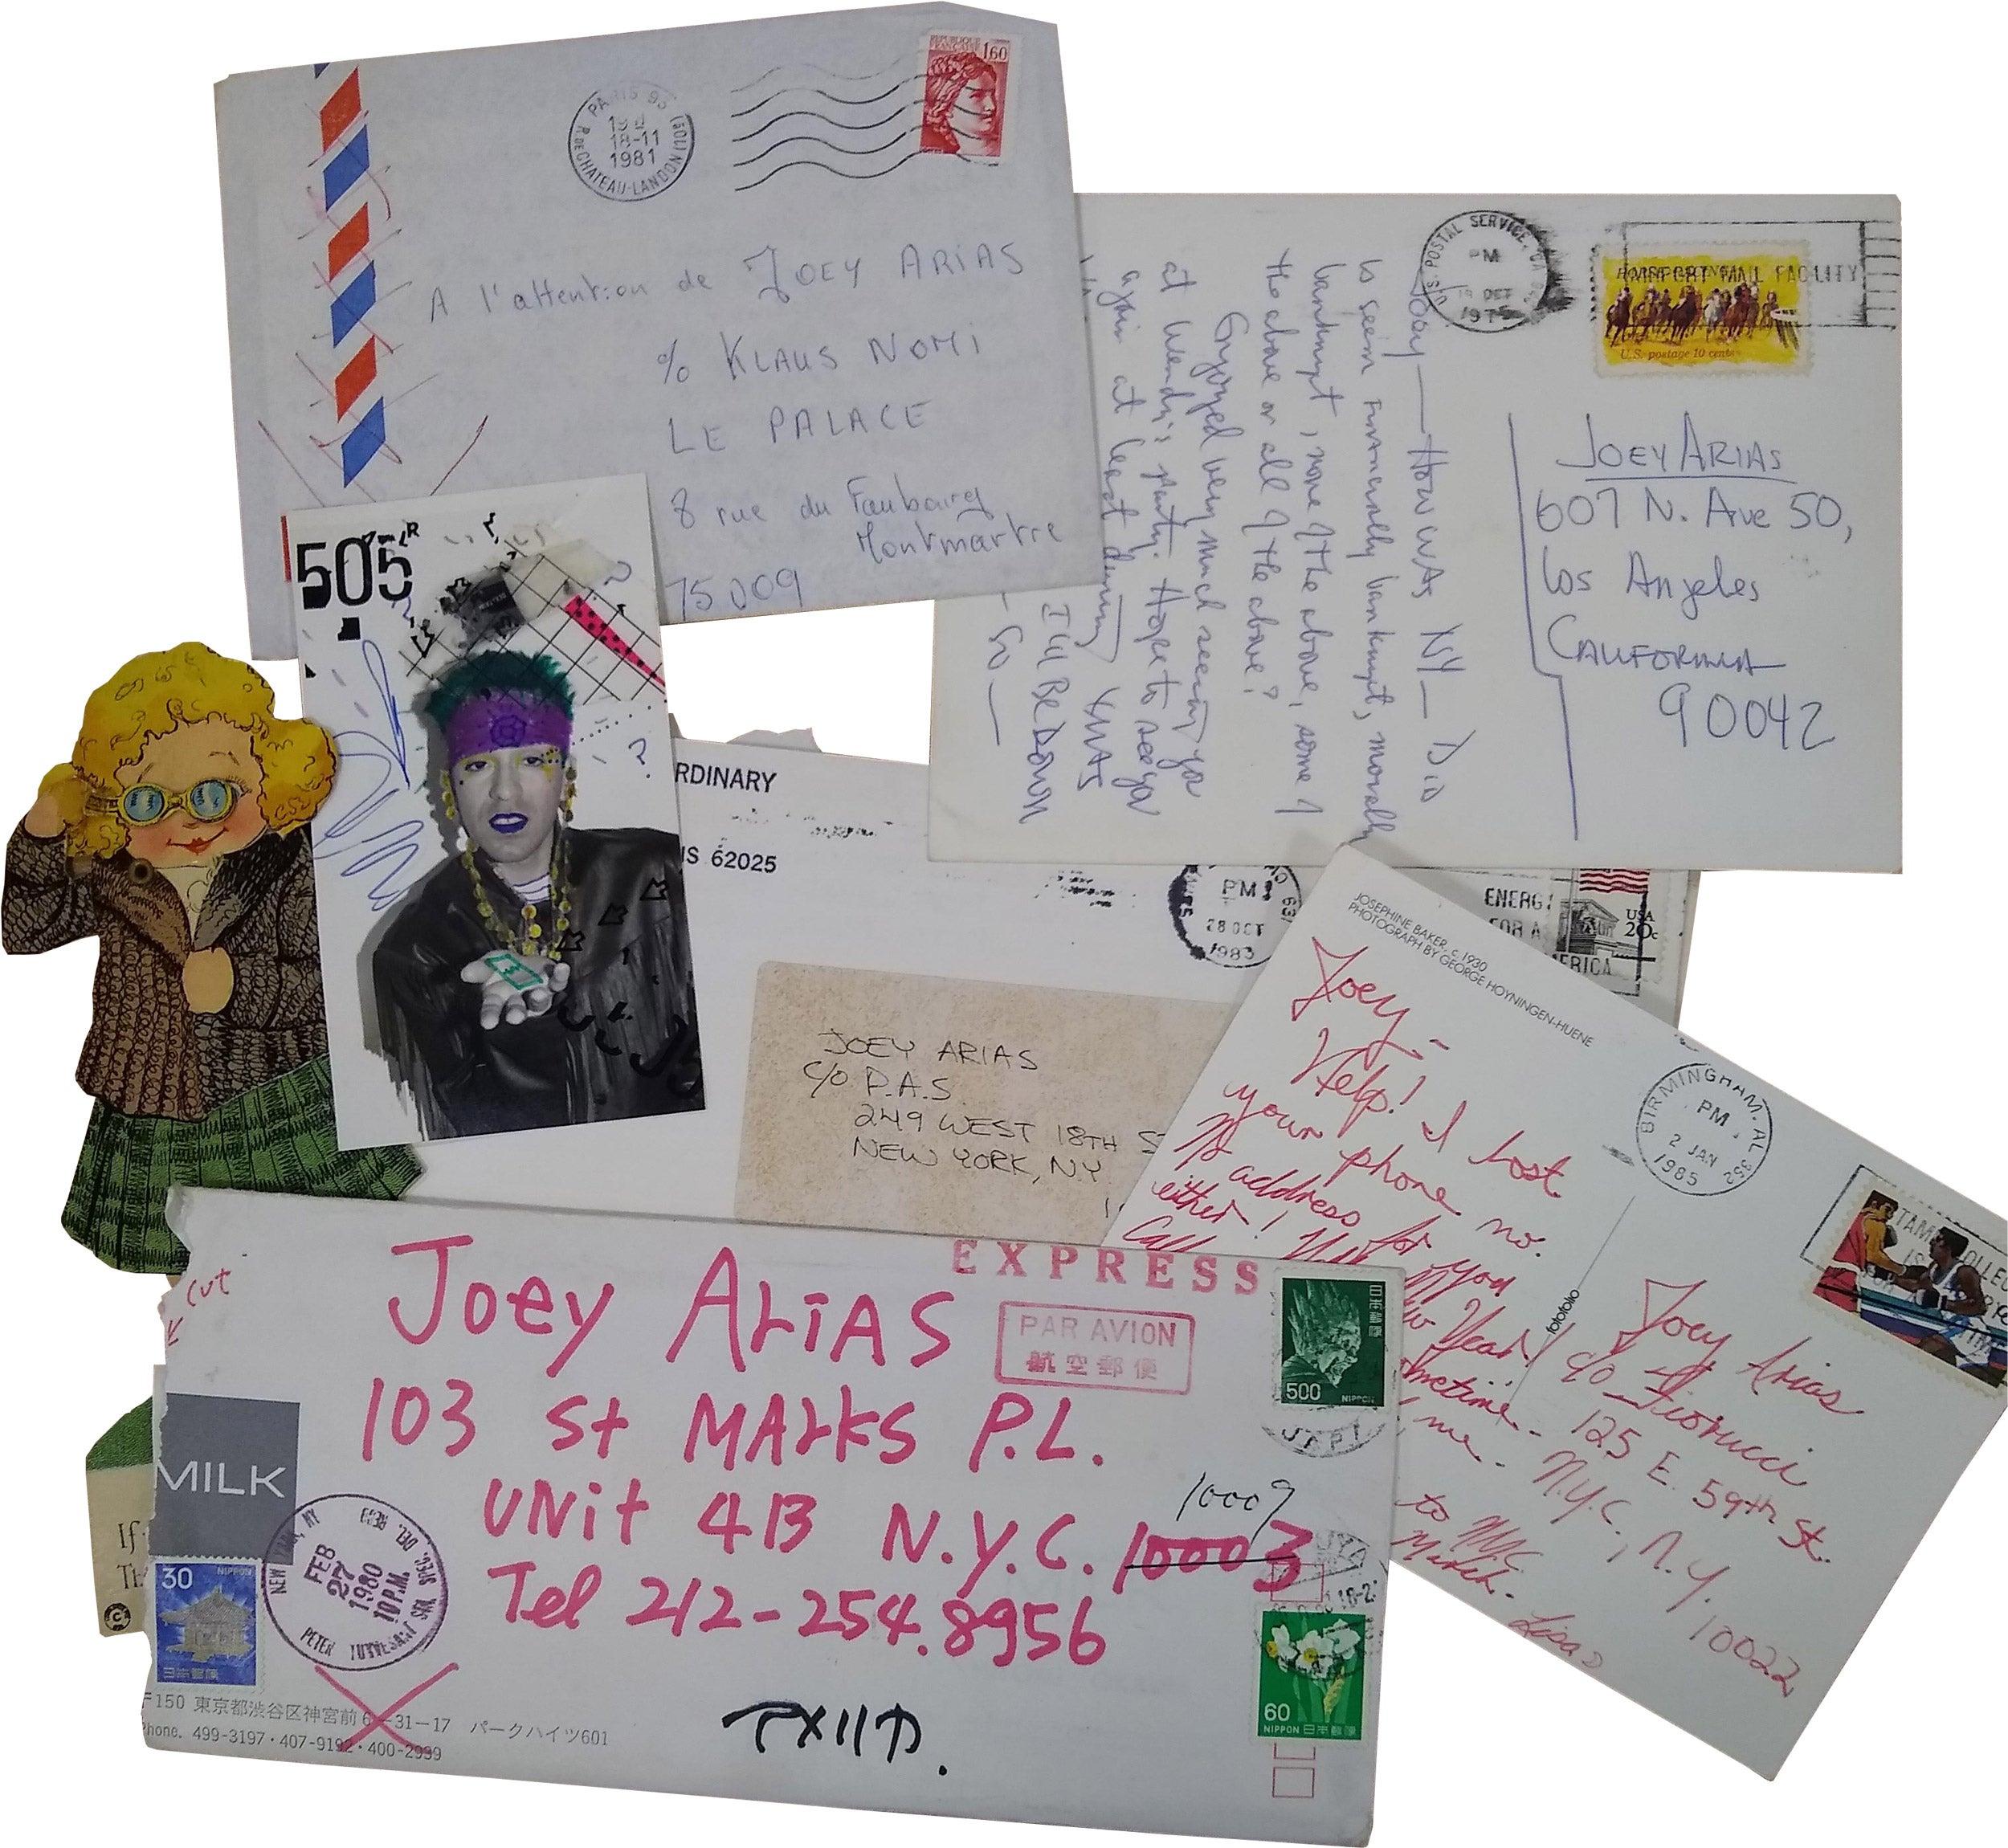 Joey Arias postcards, envelopes, letters.